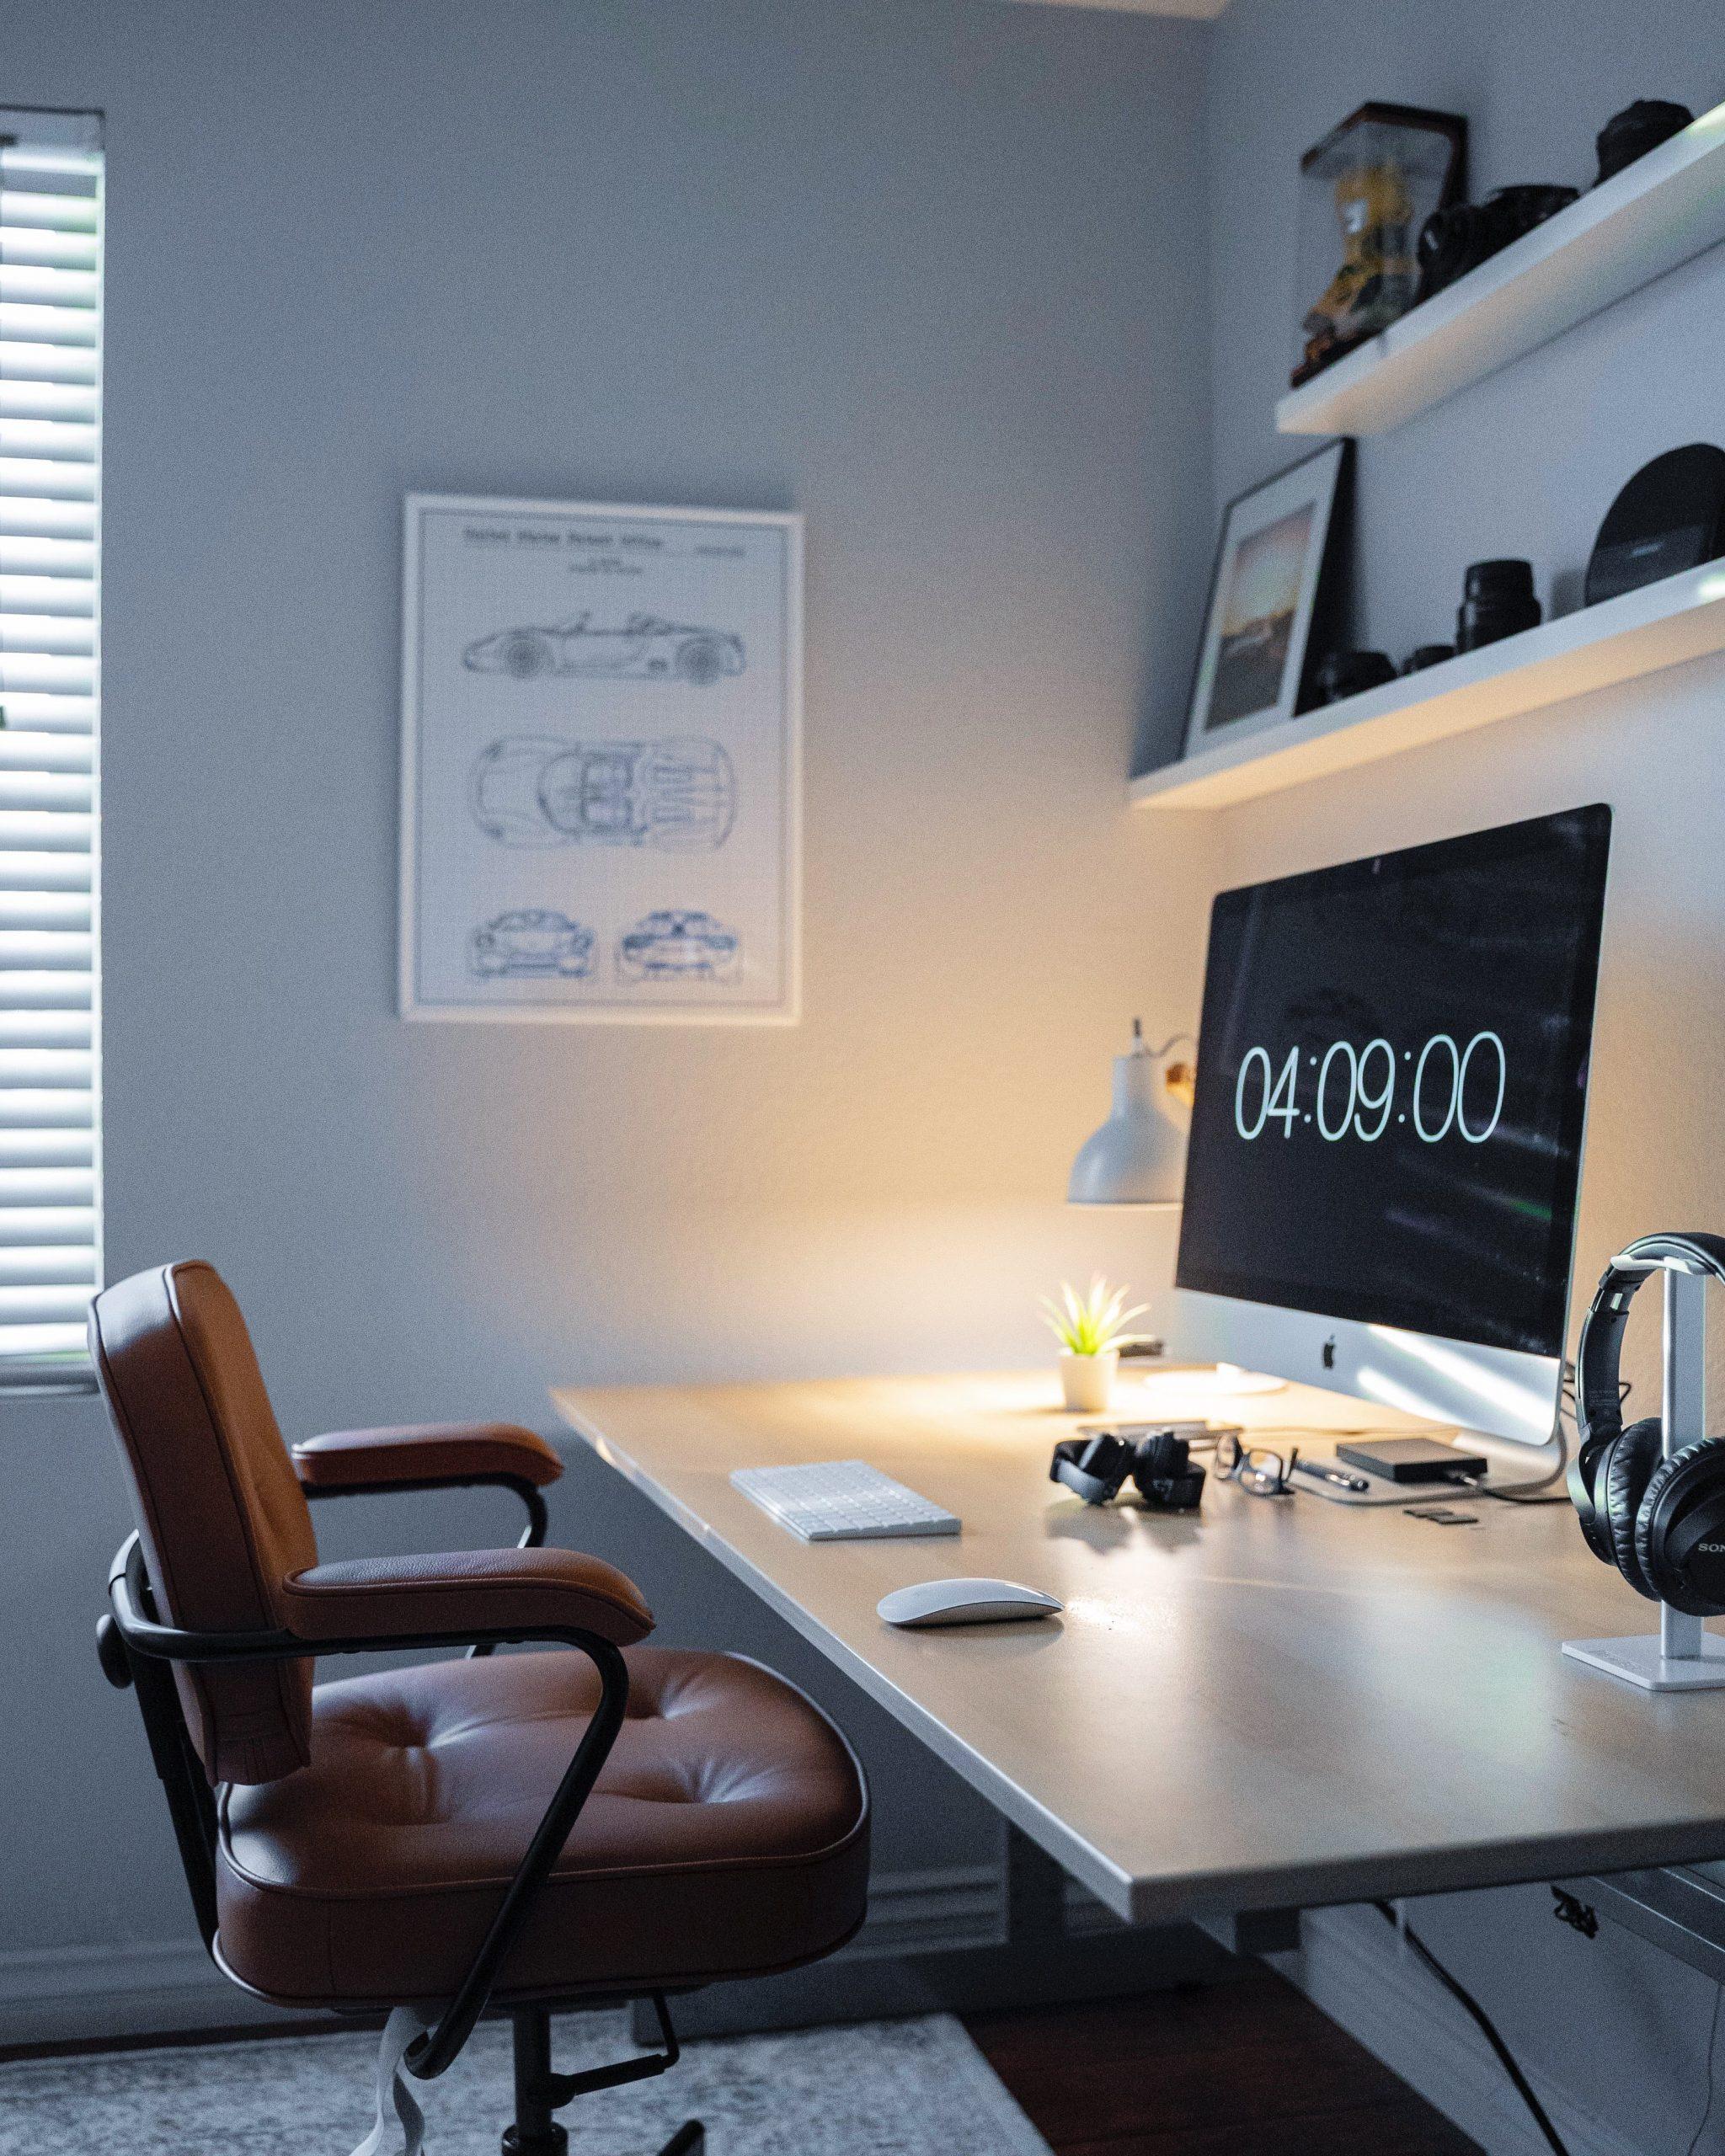 lamp on the desk